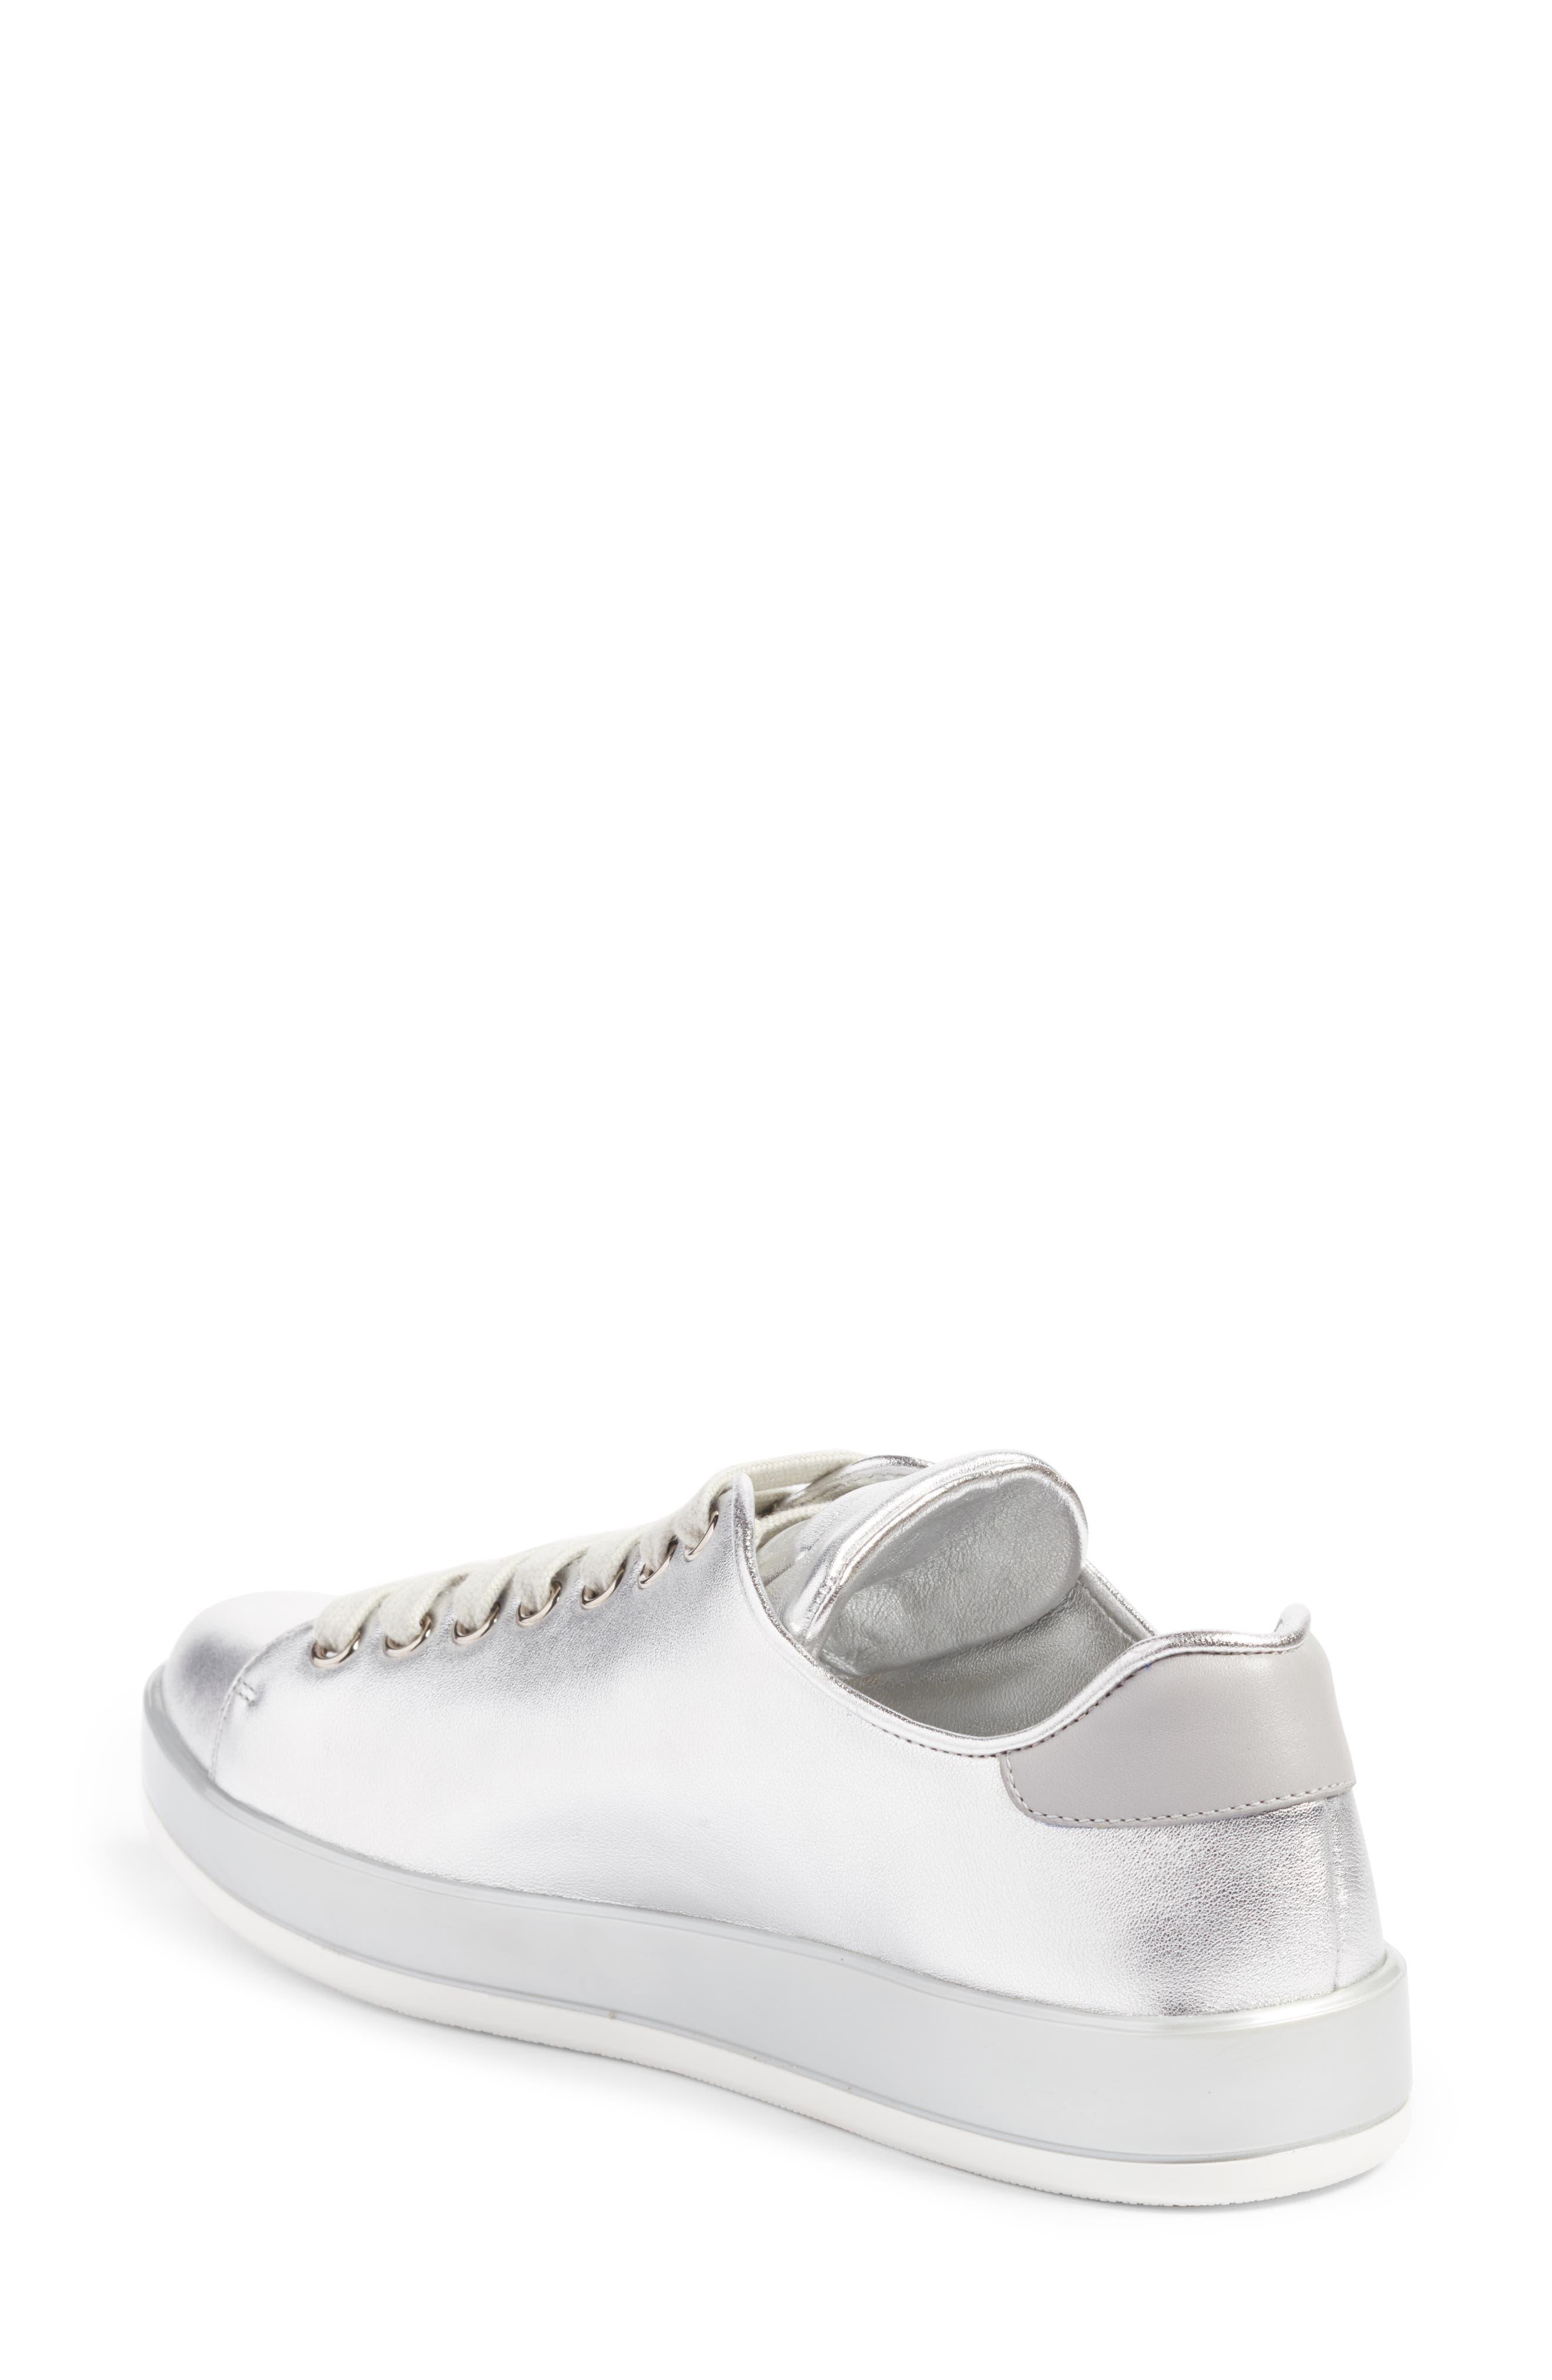 Low Top Sneaker,                             Alternate thumbnail 2, color,                             Metallic Silver